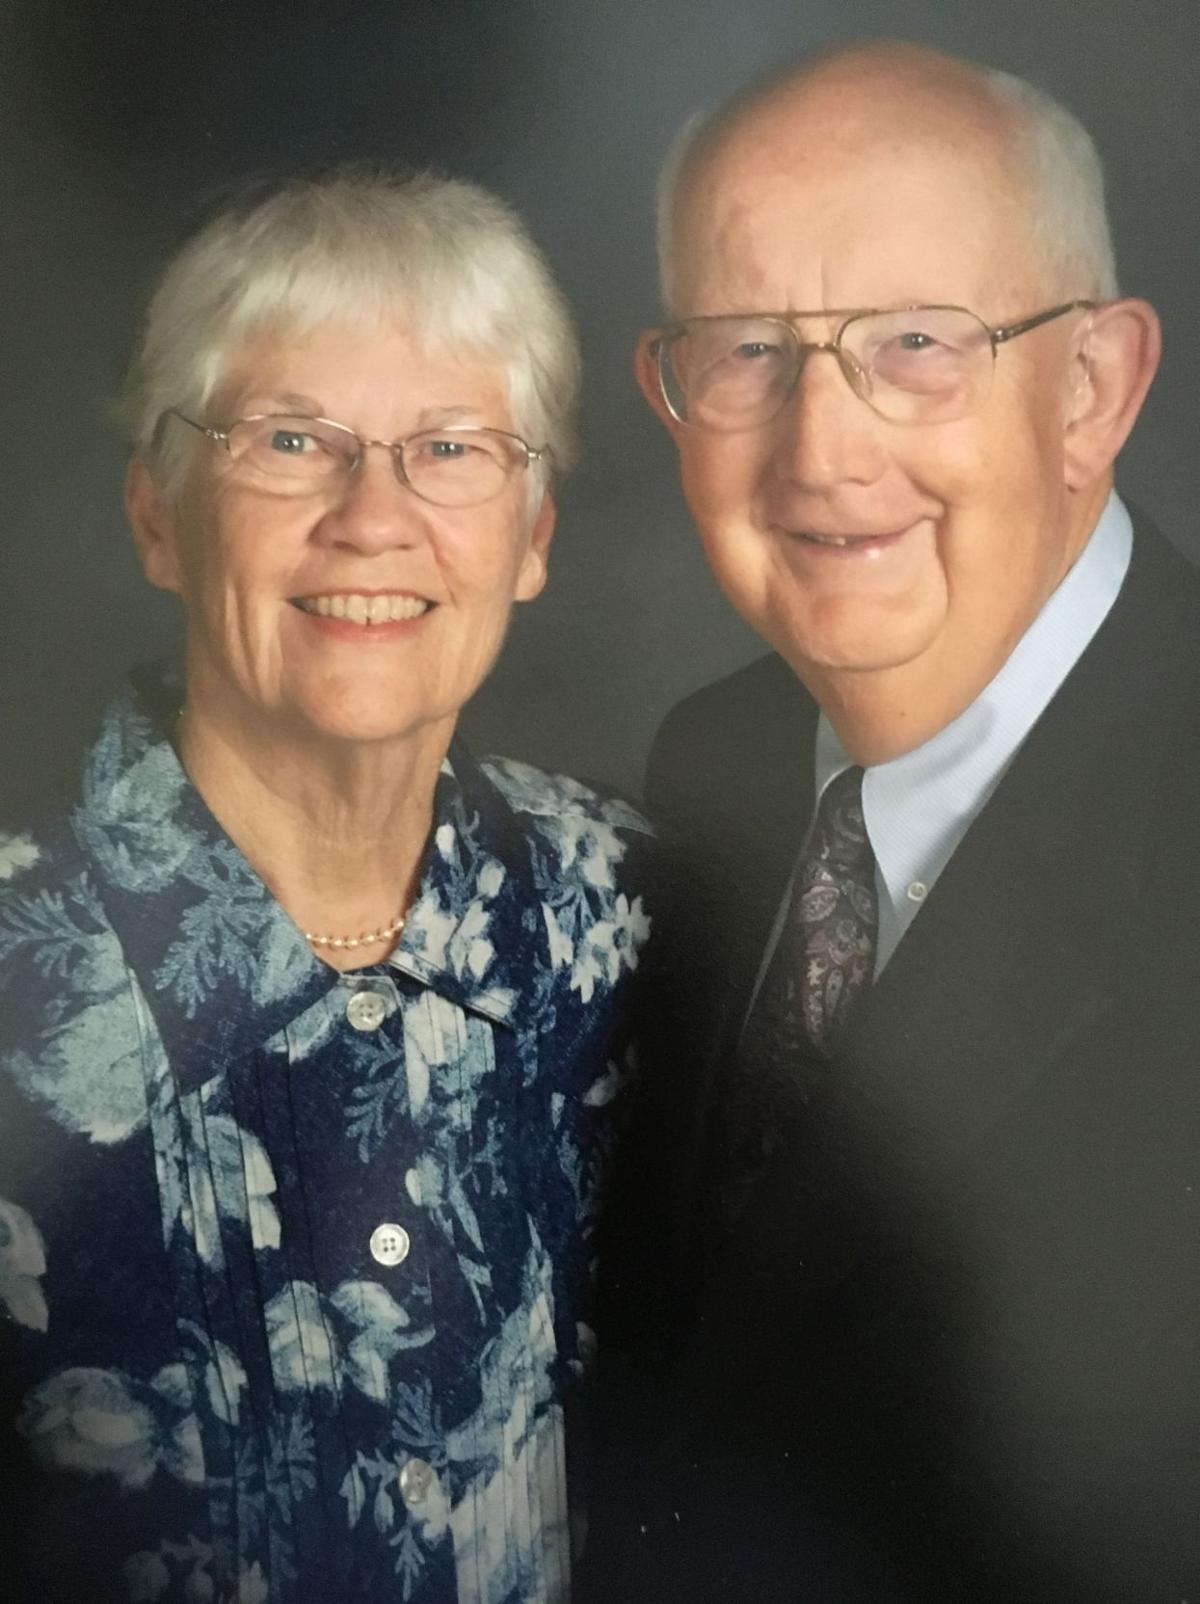 Millers celebrate 60th wedding anniversary